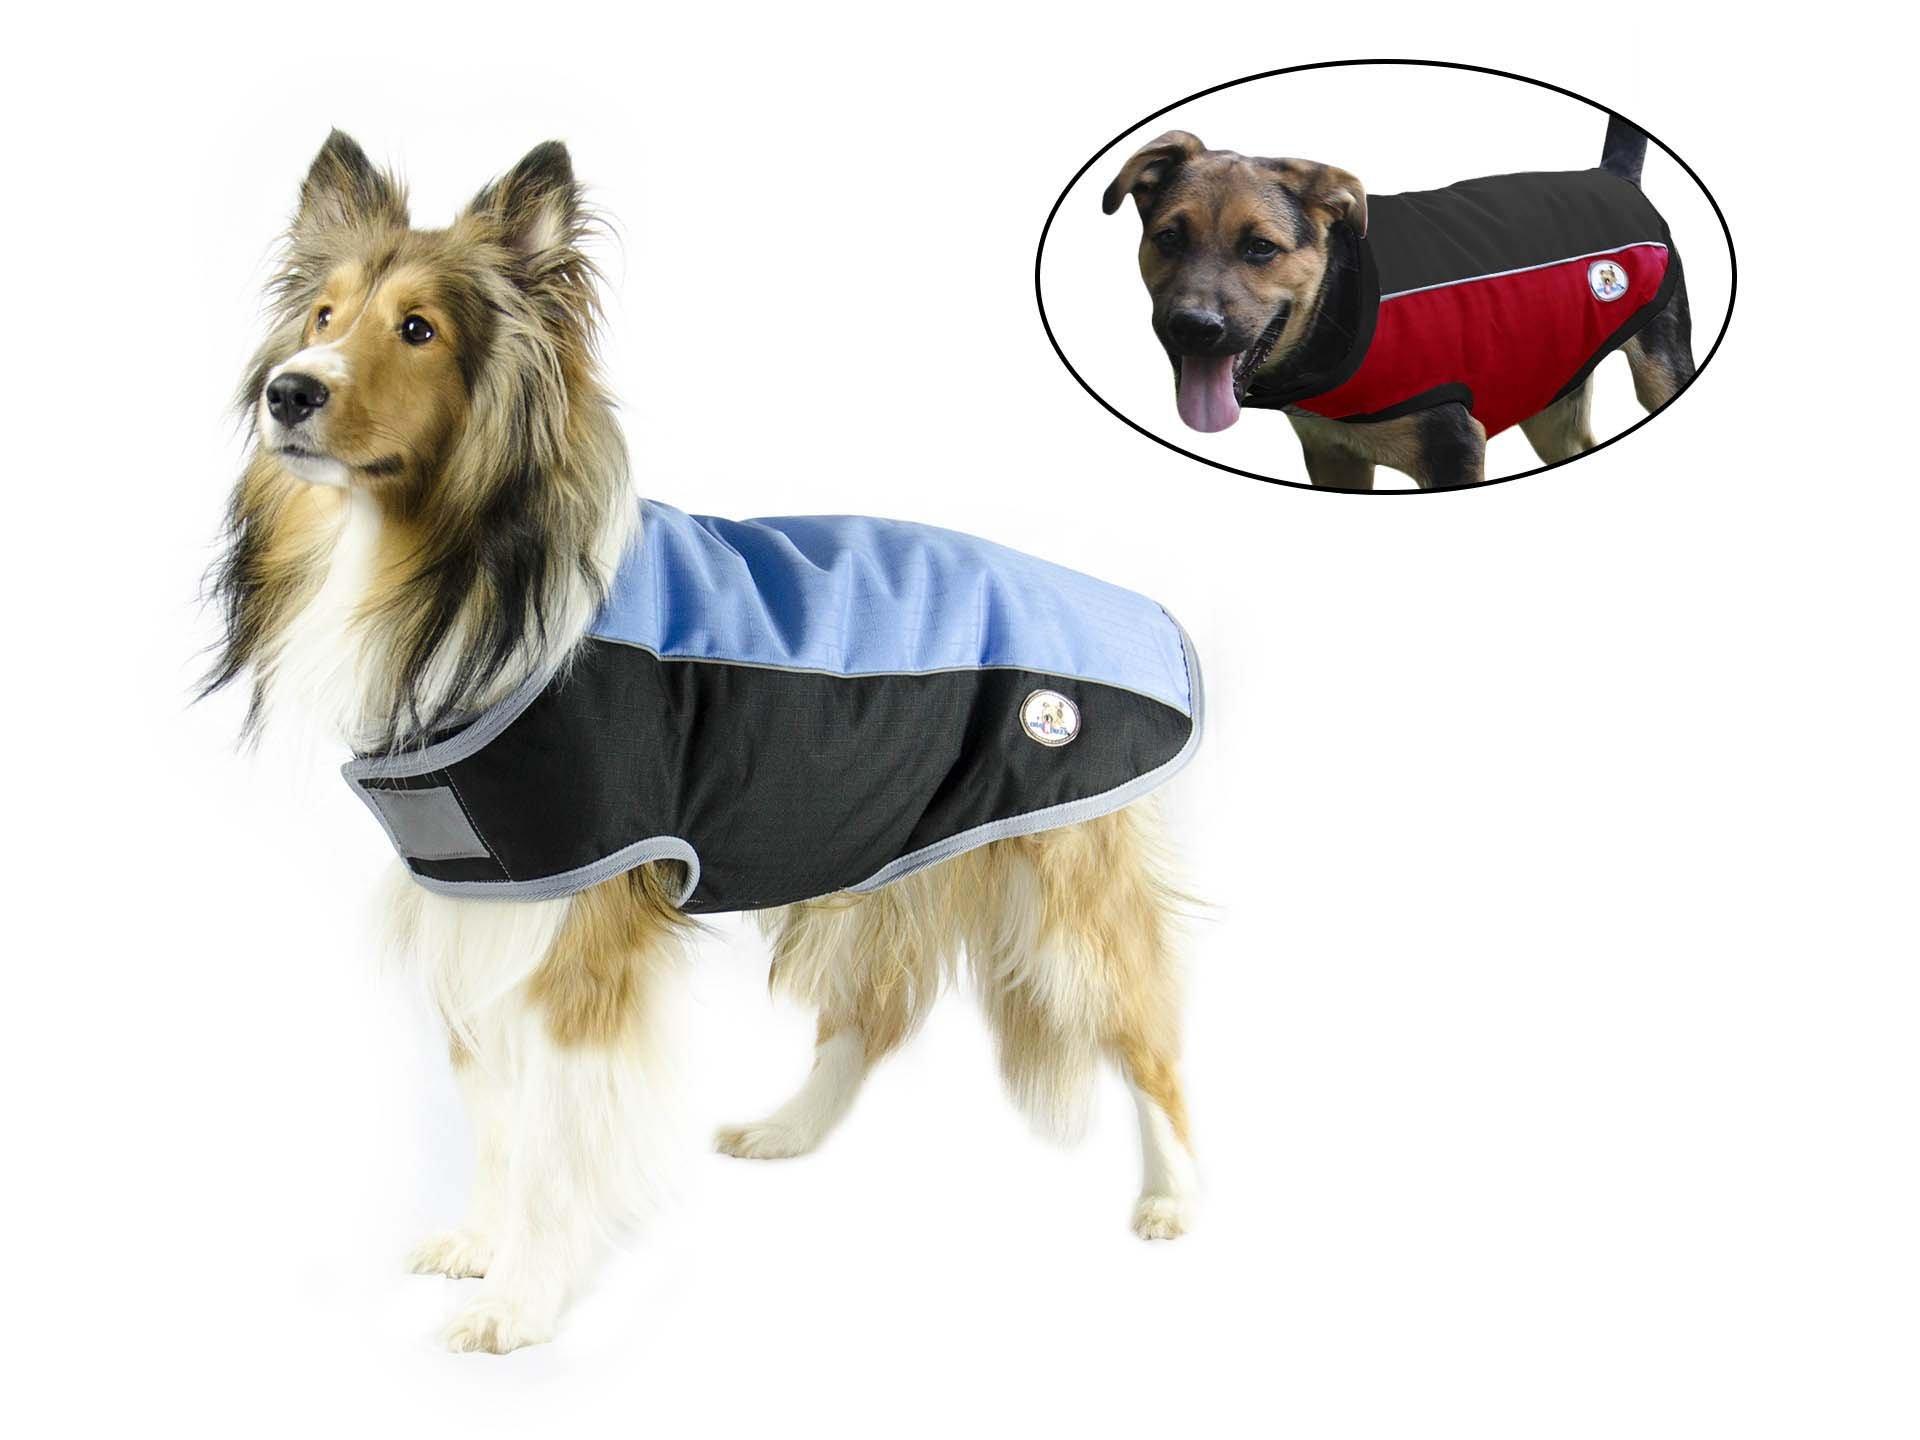 cuteNfuzzy Comfort Fit Reflective Winter Dog Blanket 600D Polyfil 150 lining 210T (X-Small, Black/Sky Blue)